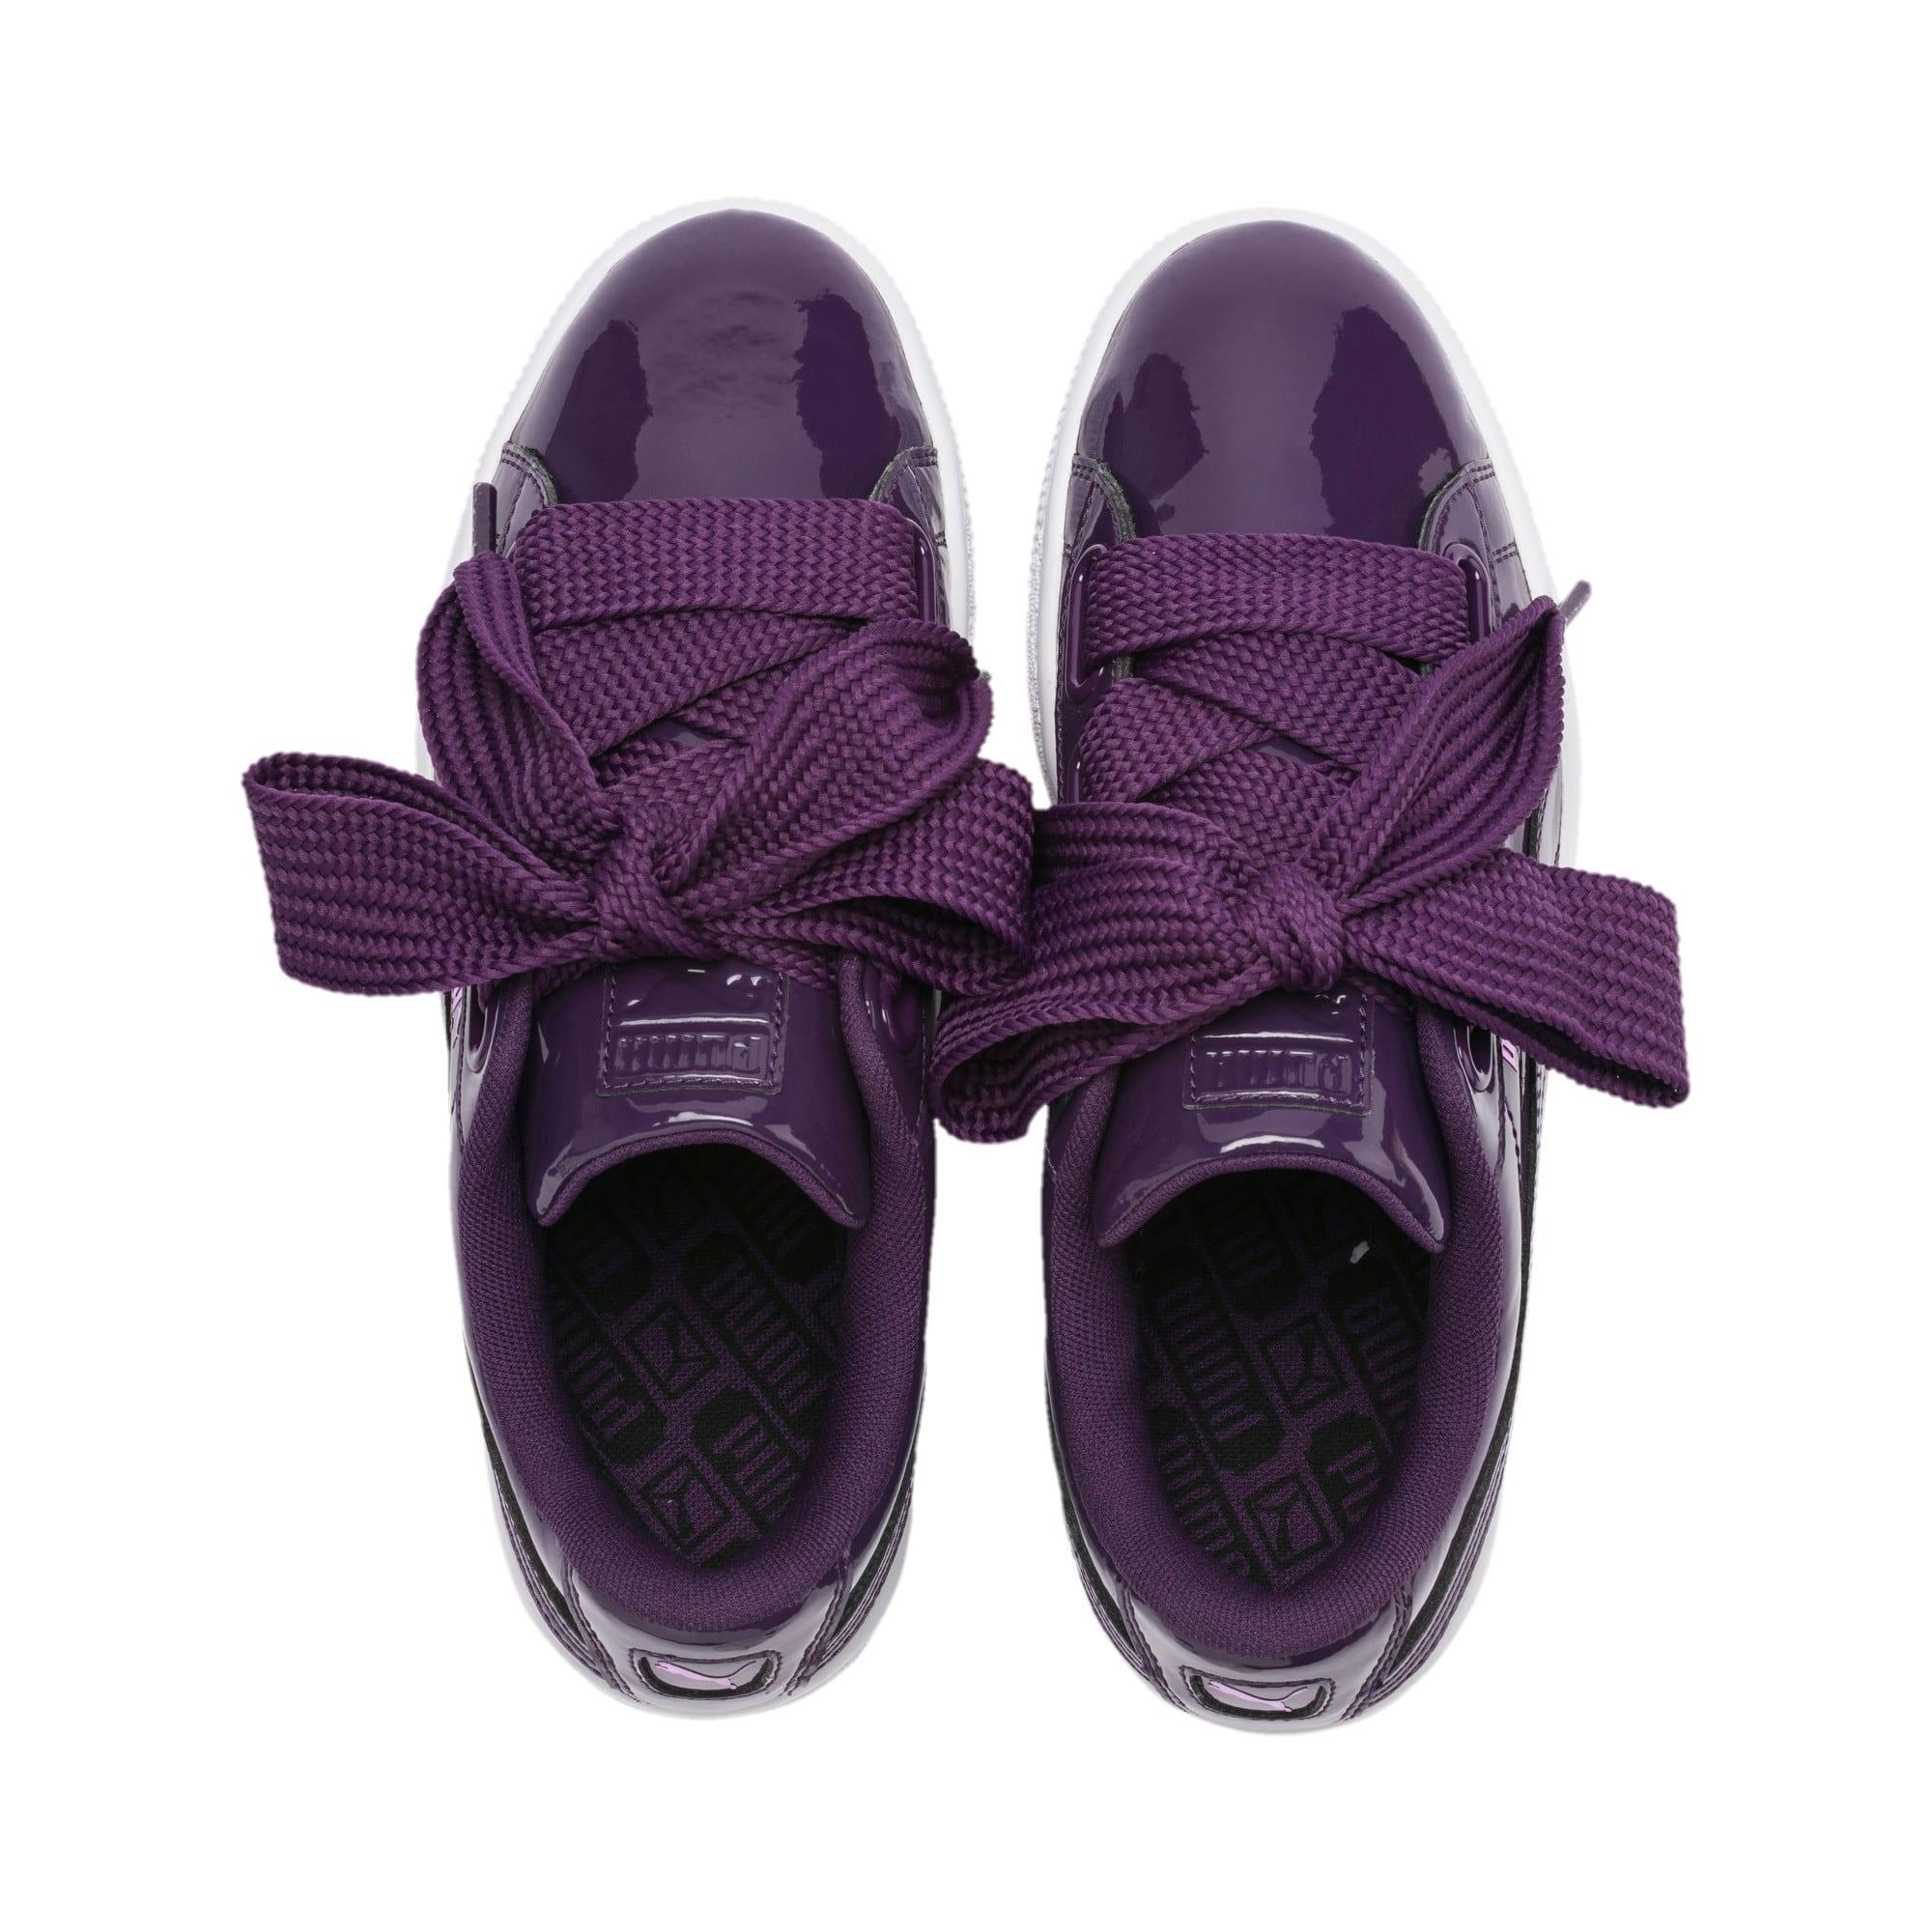 Thumbnail 6 of Basket Heart Patent Women's Sneakers, Indigo-Puma White, medium